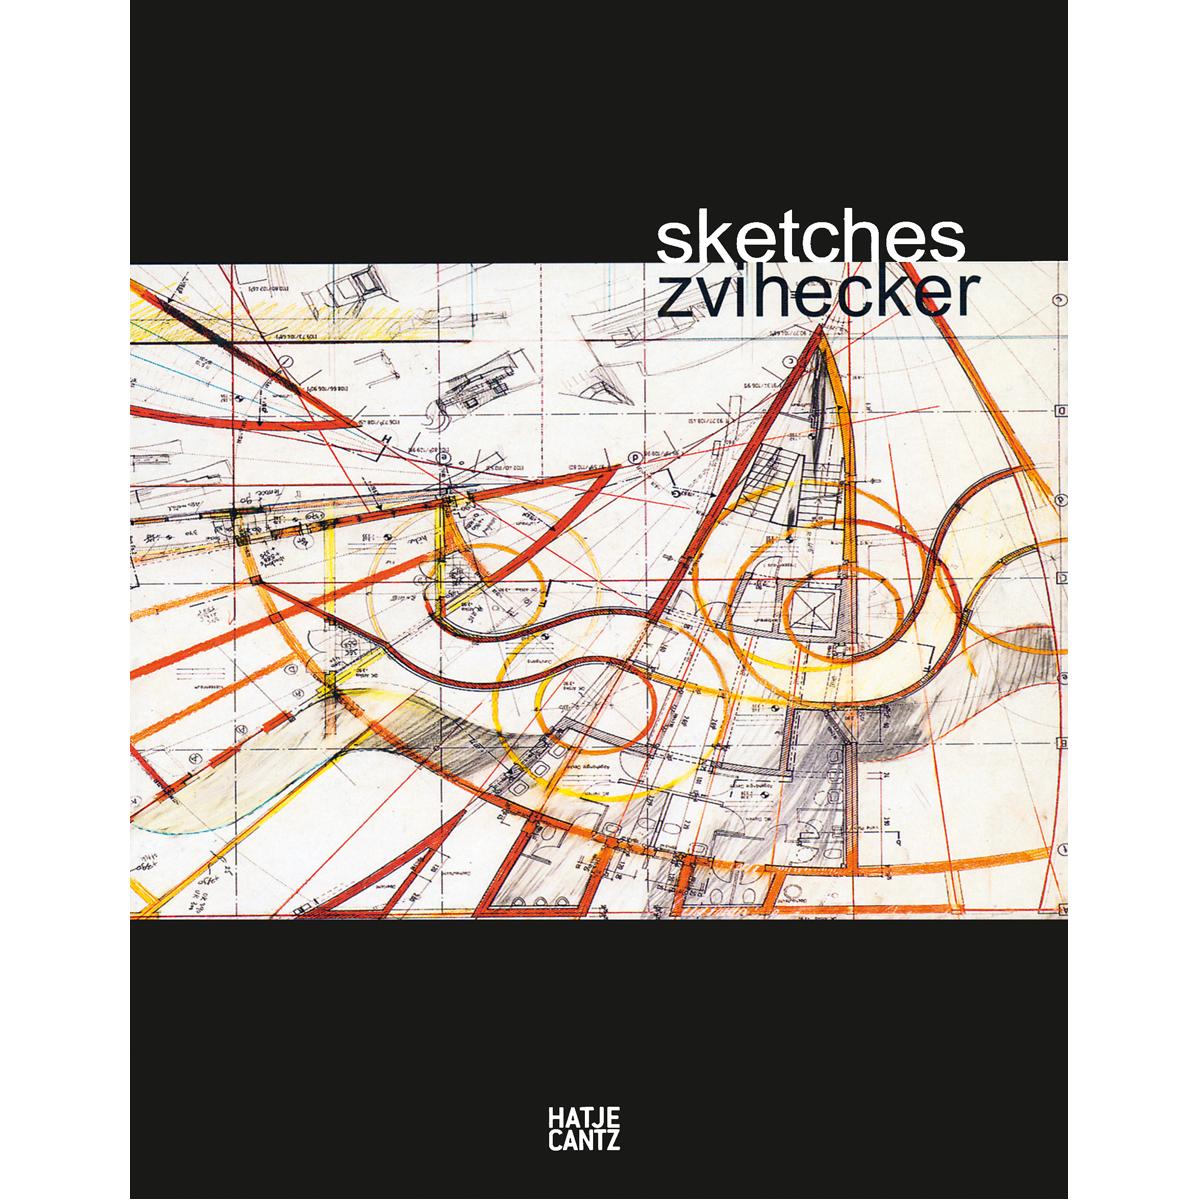 Zvi Hecker: Sketches